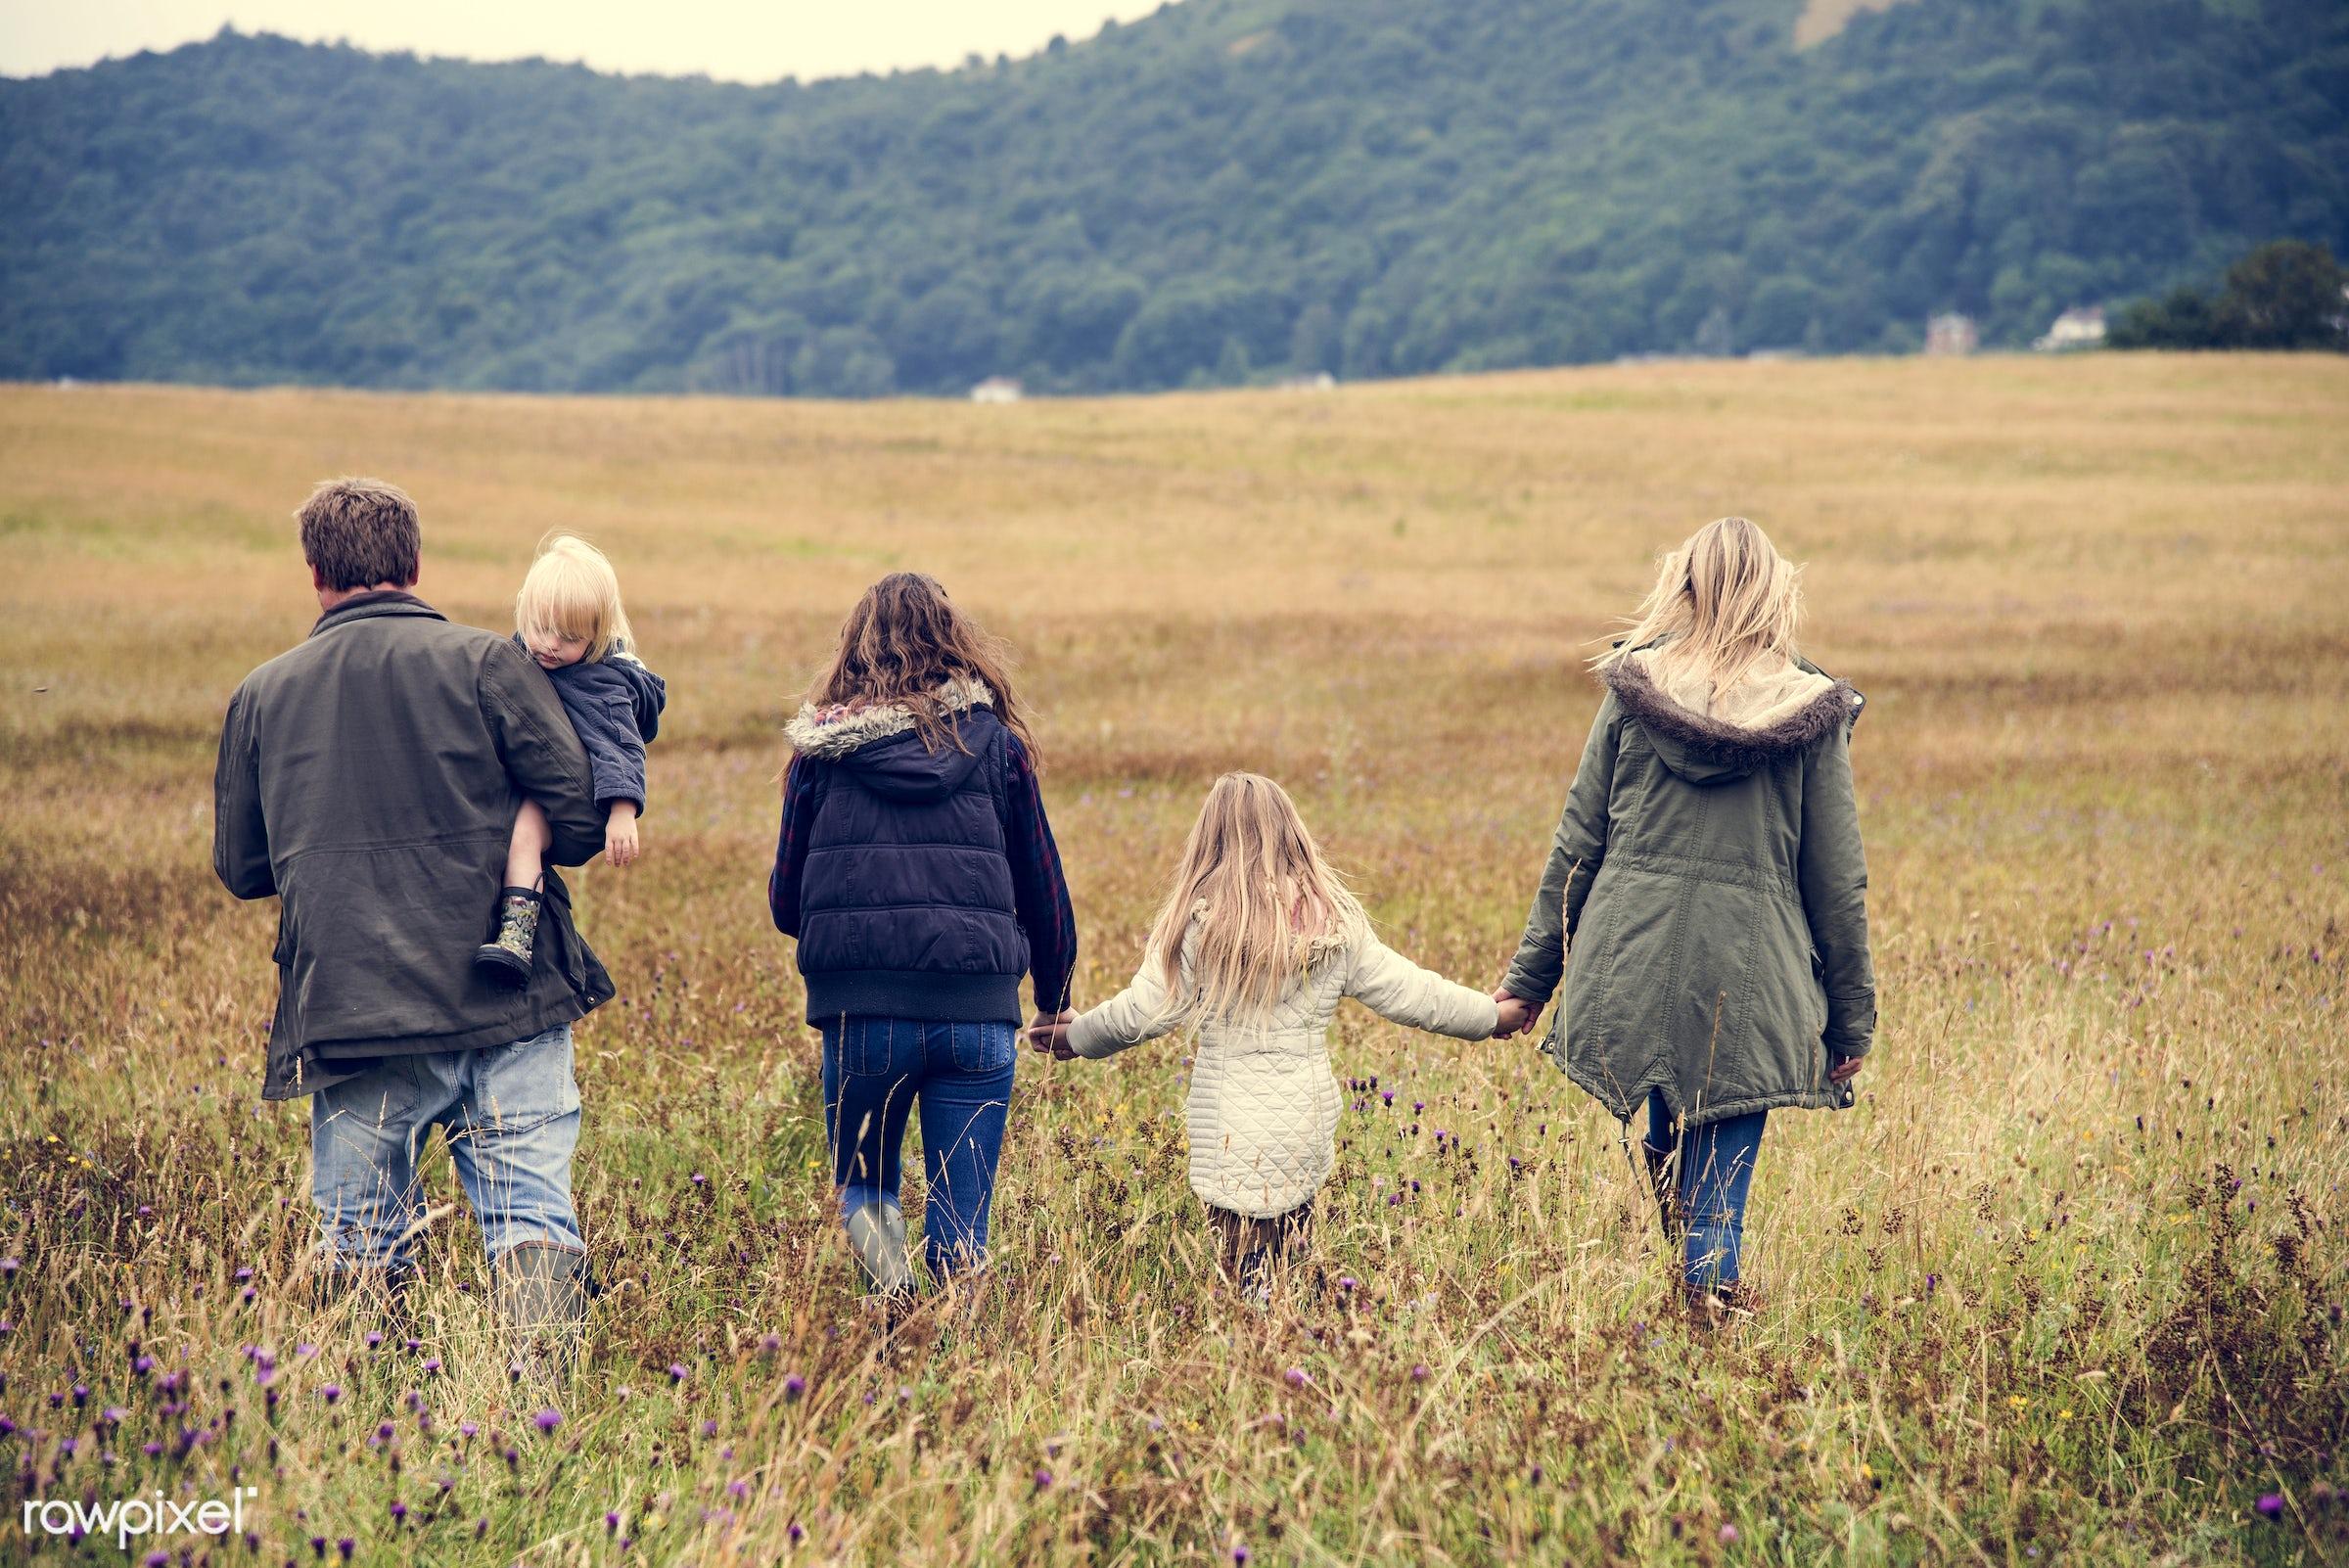 bonding, boy, care, casual, cheerful, childhood, children, daughter, enjoyment, environment, environmental, family, father,...